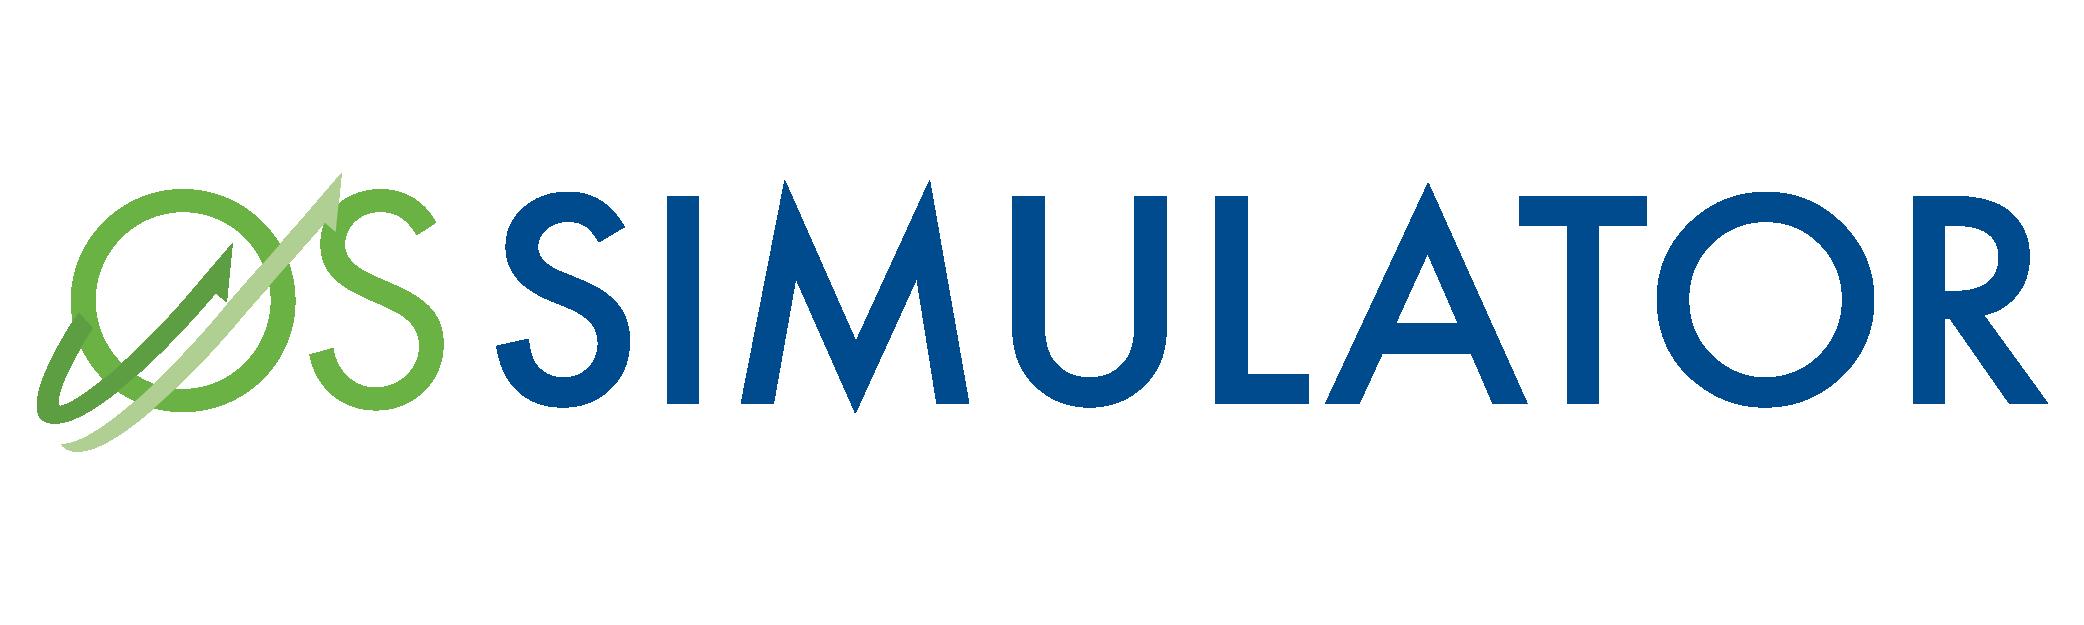 OS Simulator Logo 1